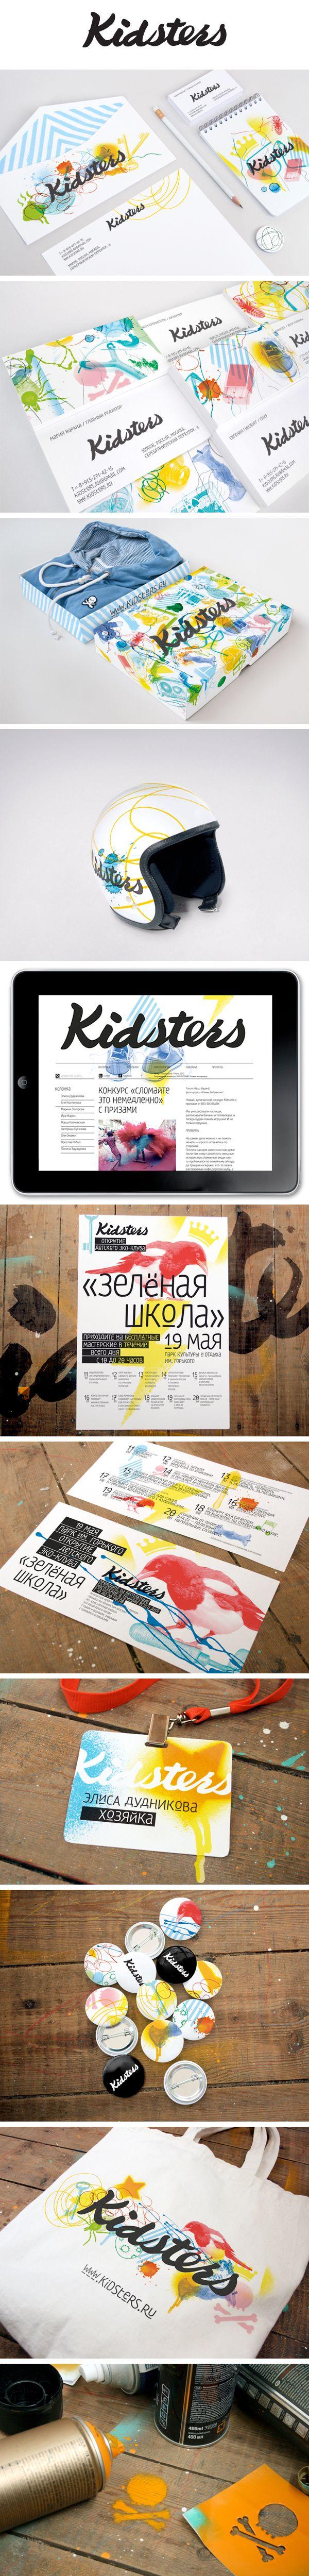 """Kidsters"" by Ivan Burmistrov #identity #packaging #branding #marketing PD #infinitecreative"